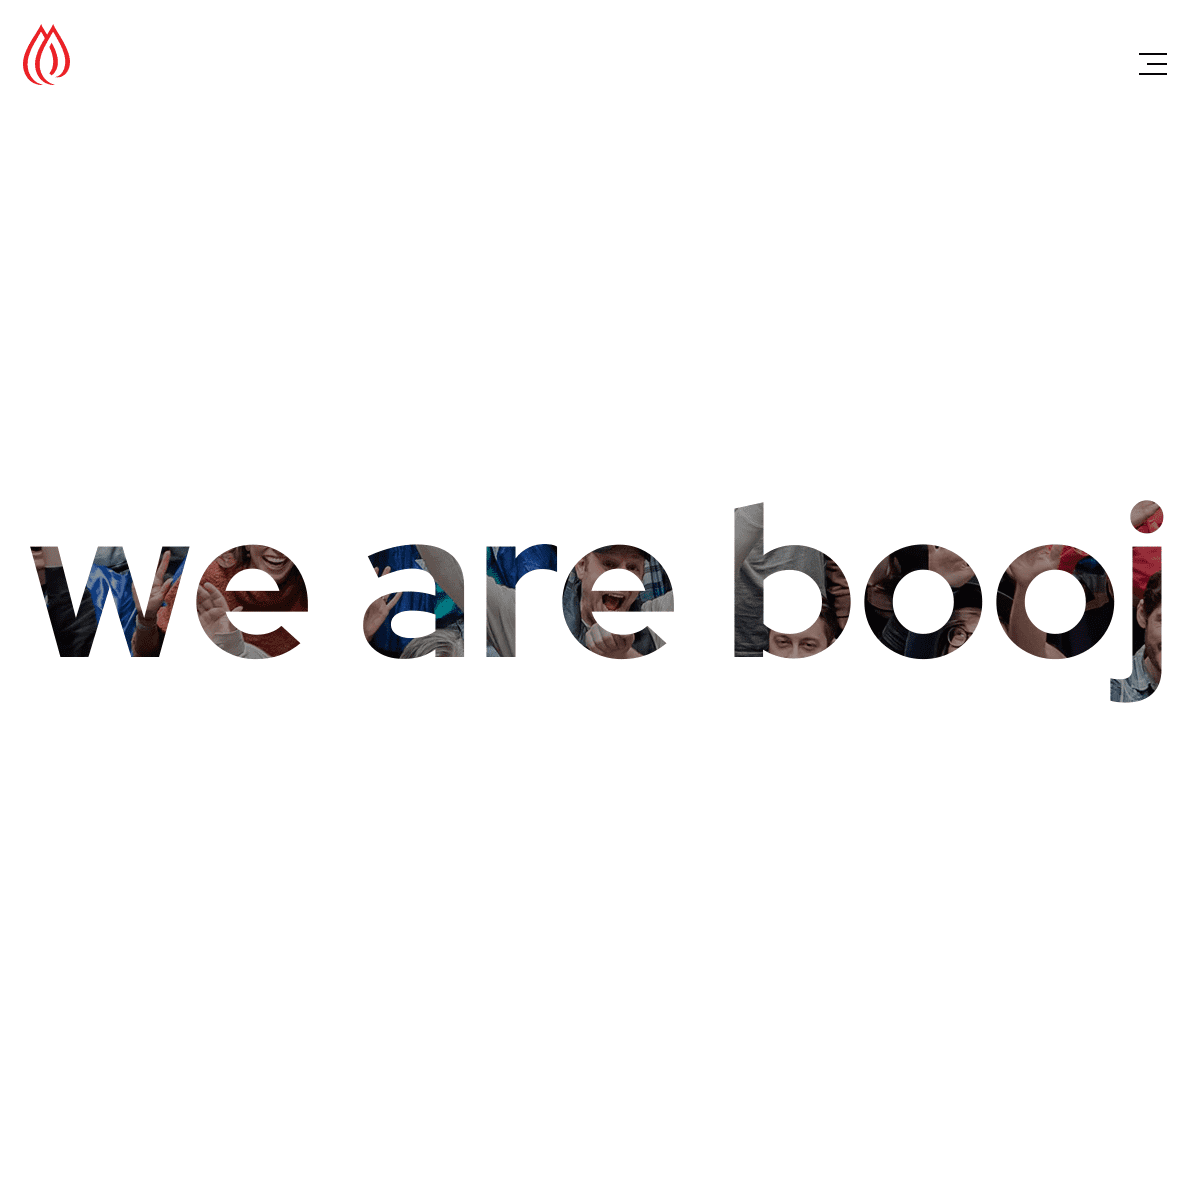 booj - web development and technology